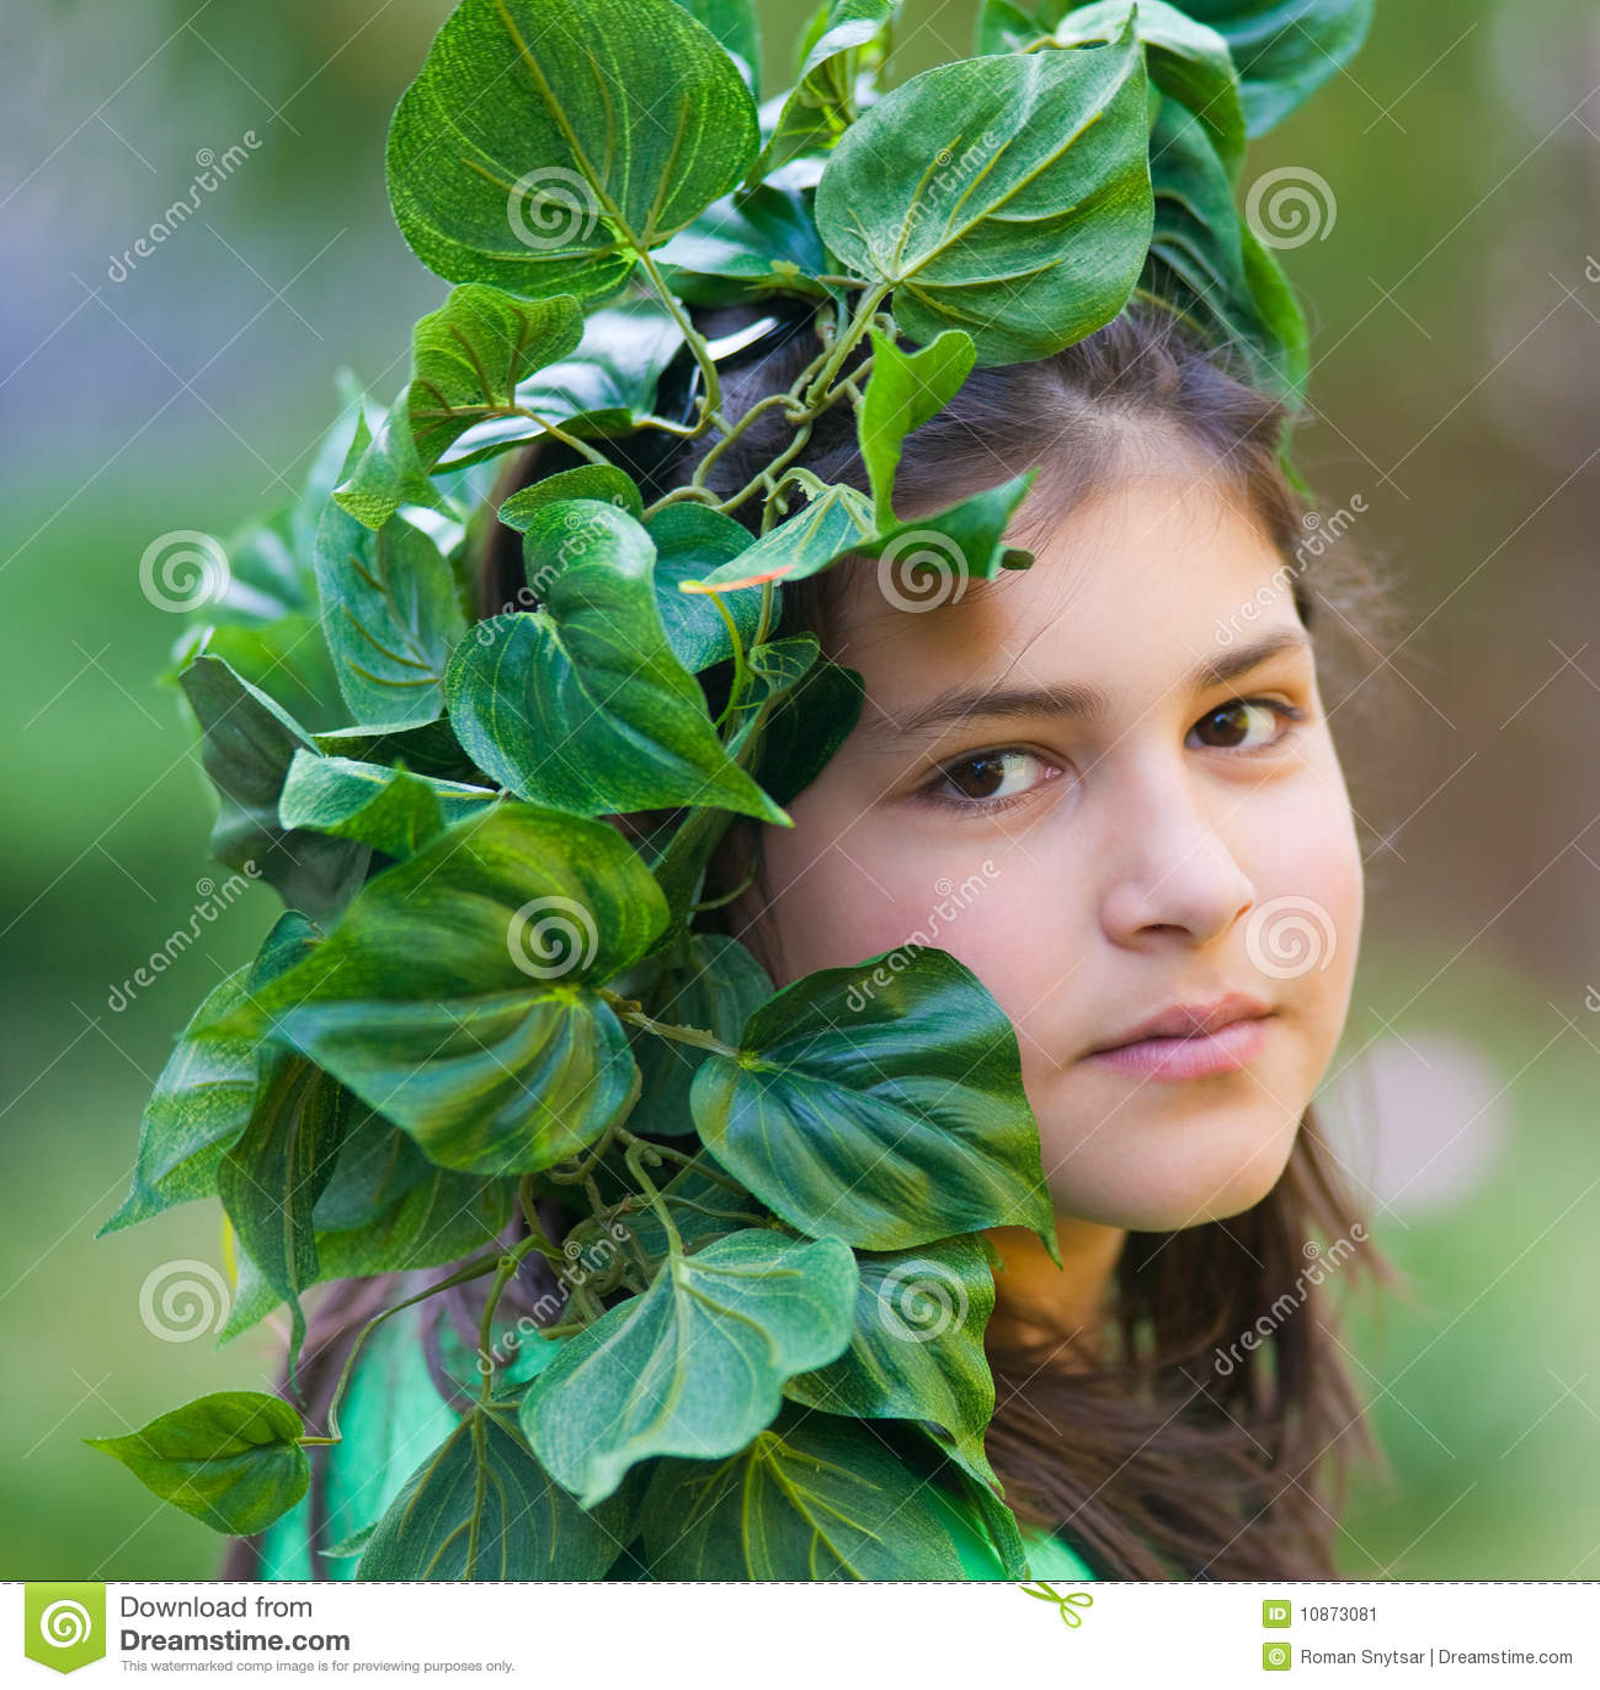 Green Leaf Nude Teens 113